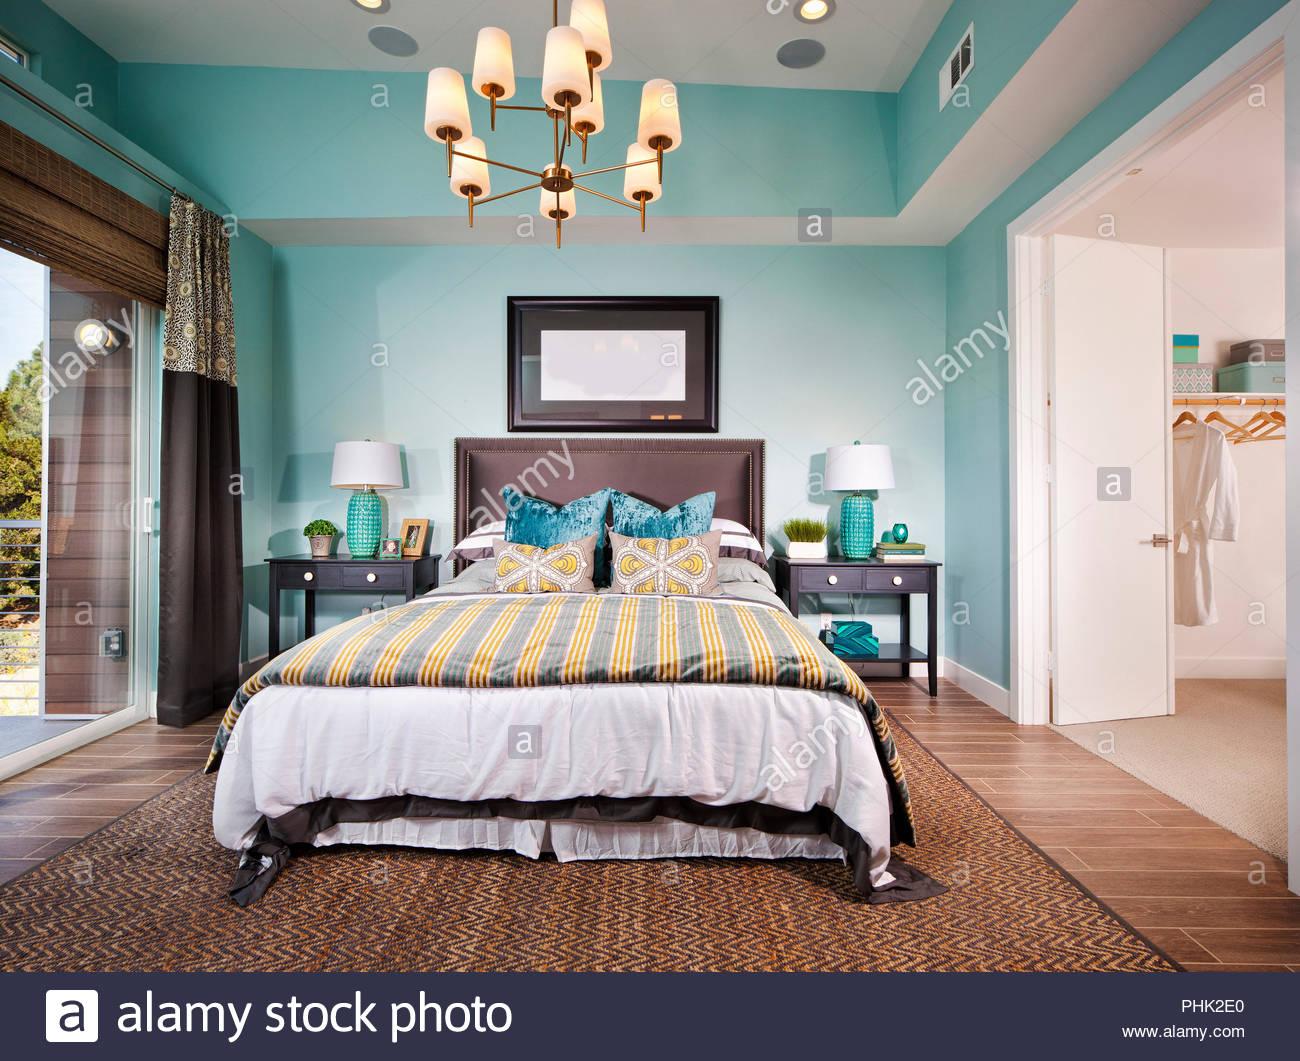 Chambre avec lustre Photo Stock